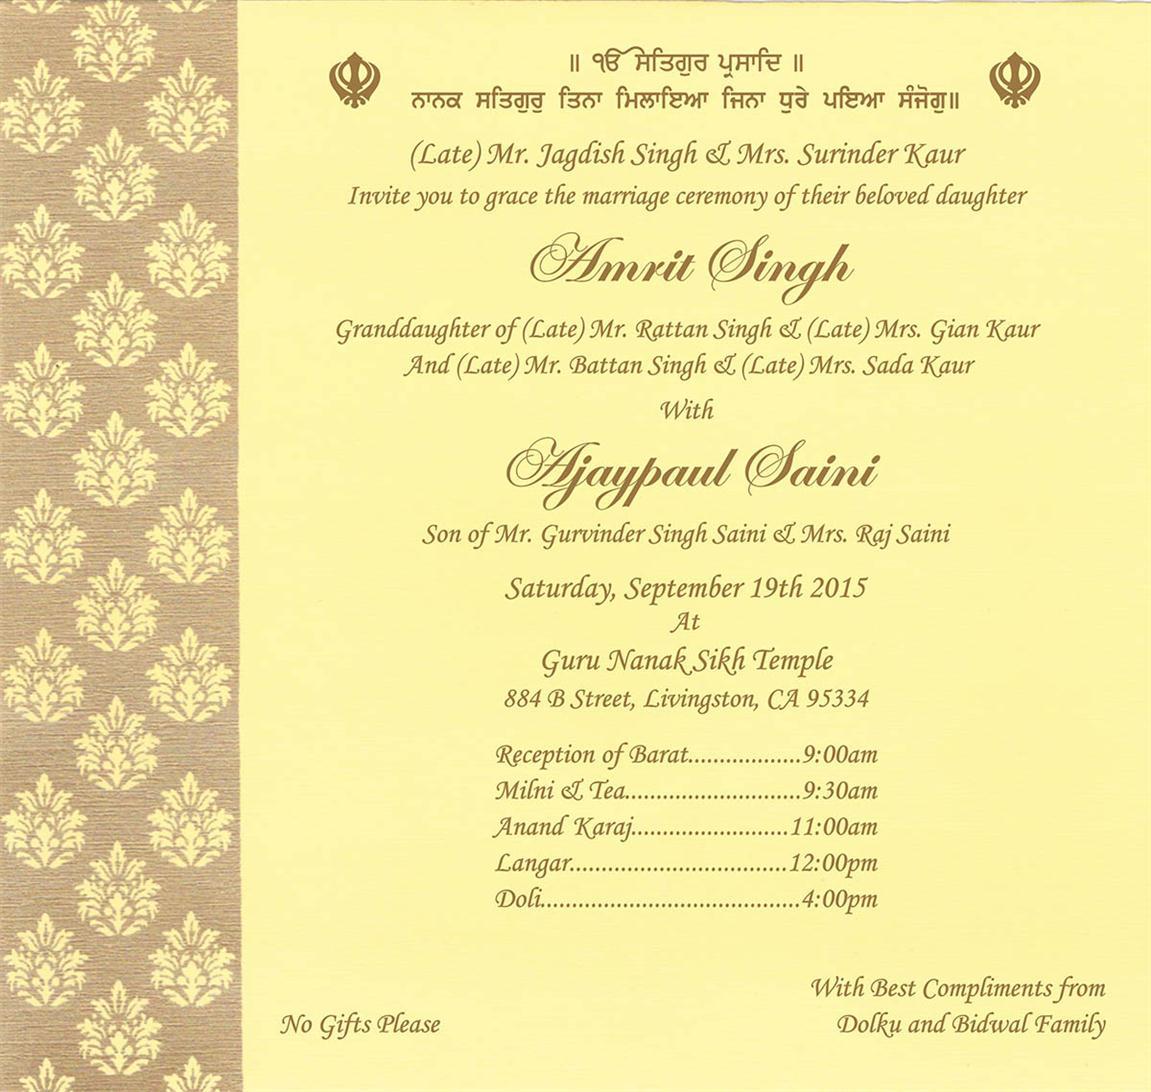 Designer wedding cards us 1410 for Chawla wedding cards boxes ludhiana punjab